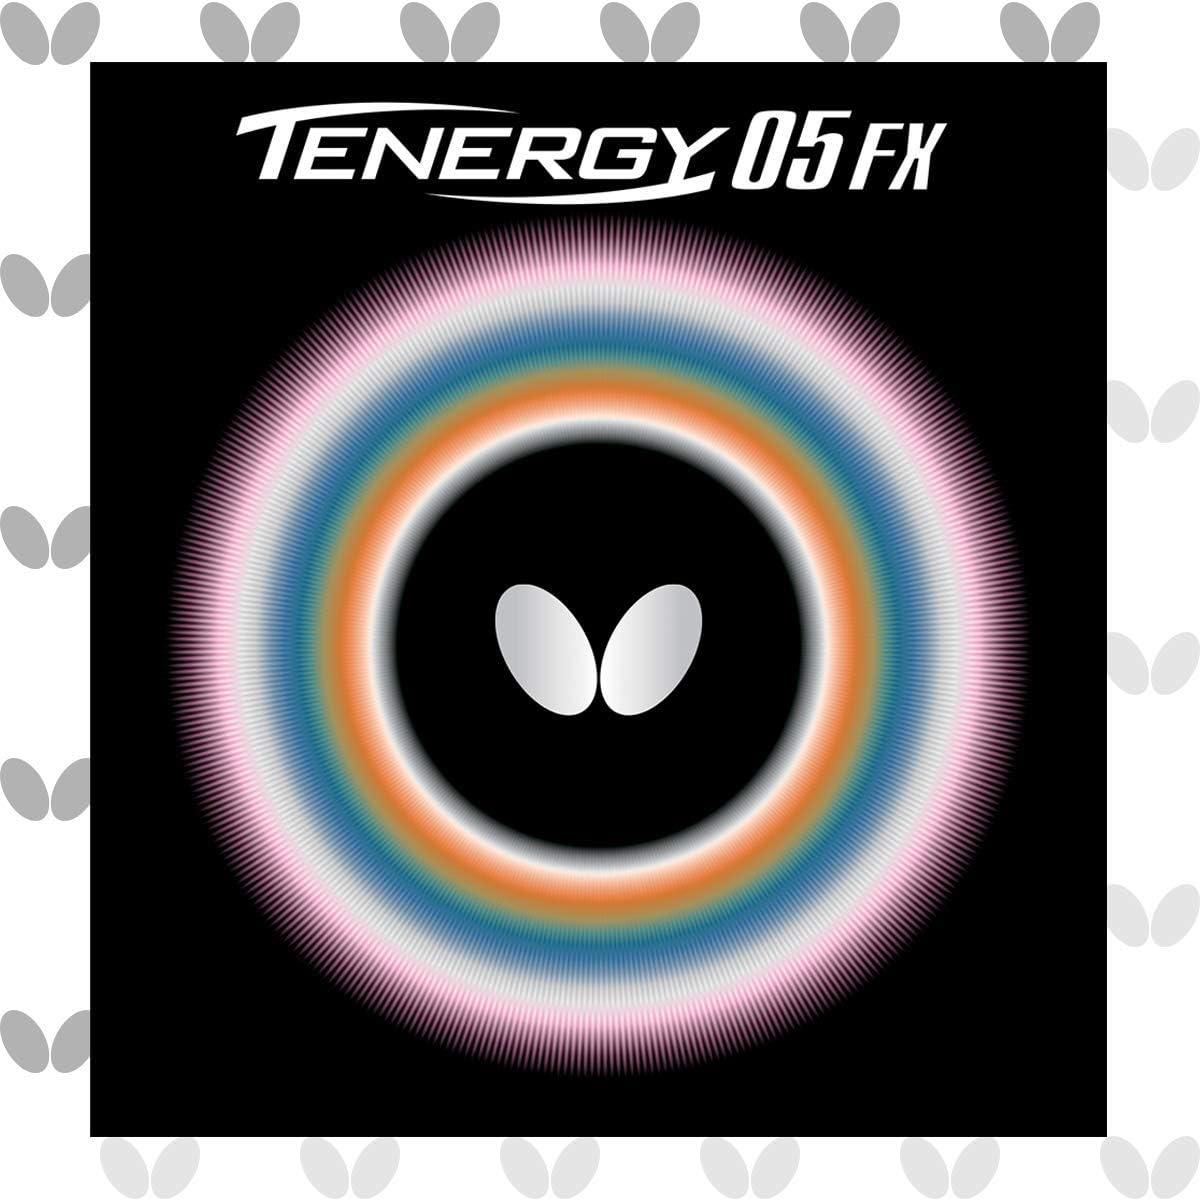 Butterfly Mariposa Tenergy 05FX Tenis de Mesa Caucho